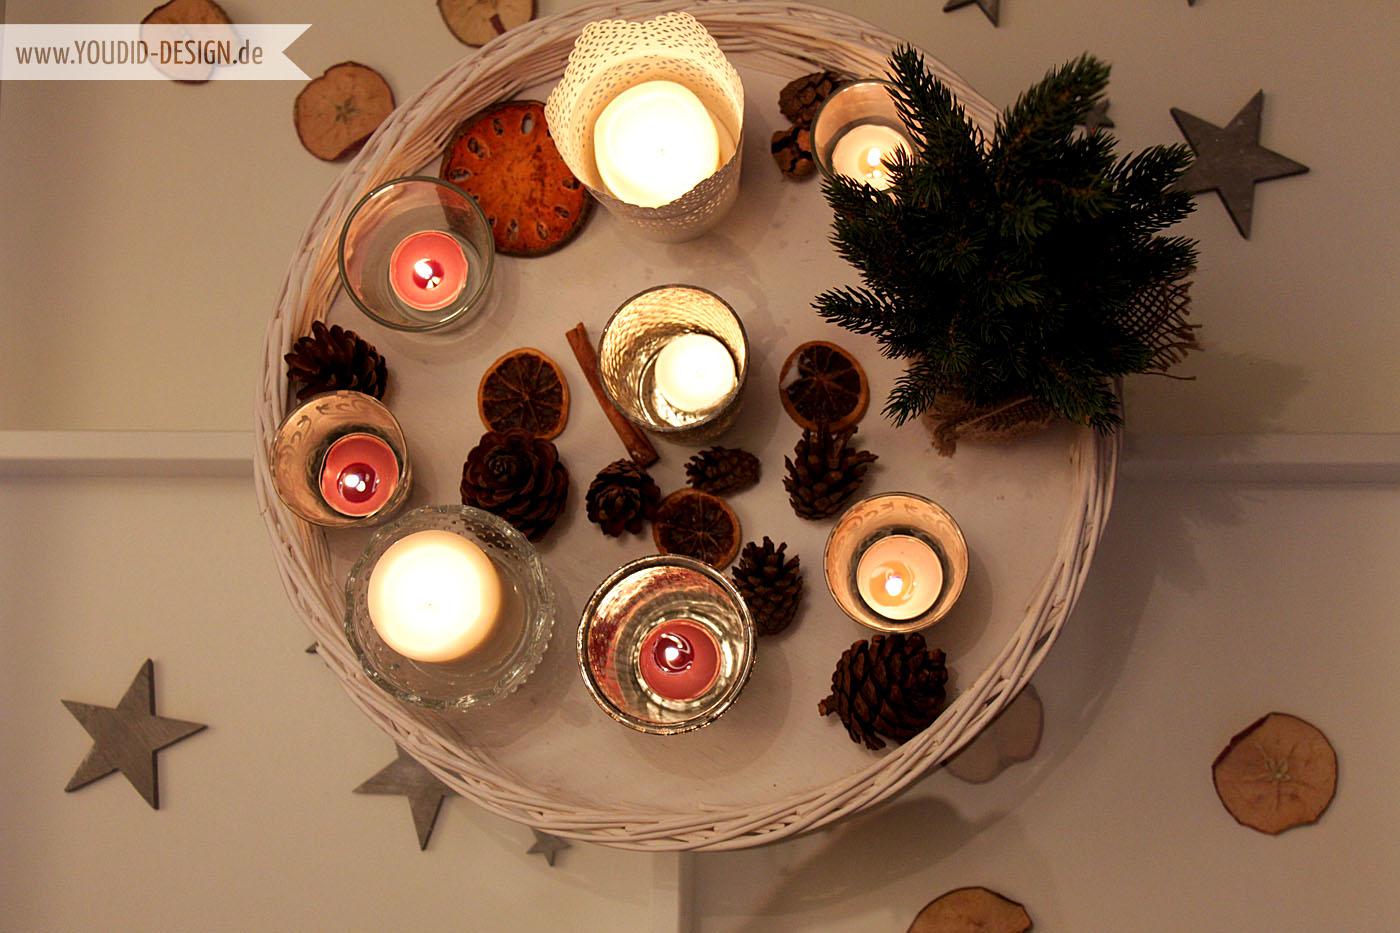 Kerzensammlung Weihnachten | www.youdid-design.de